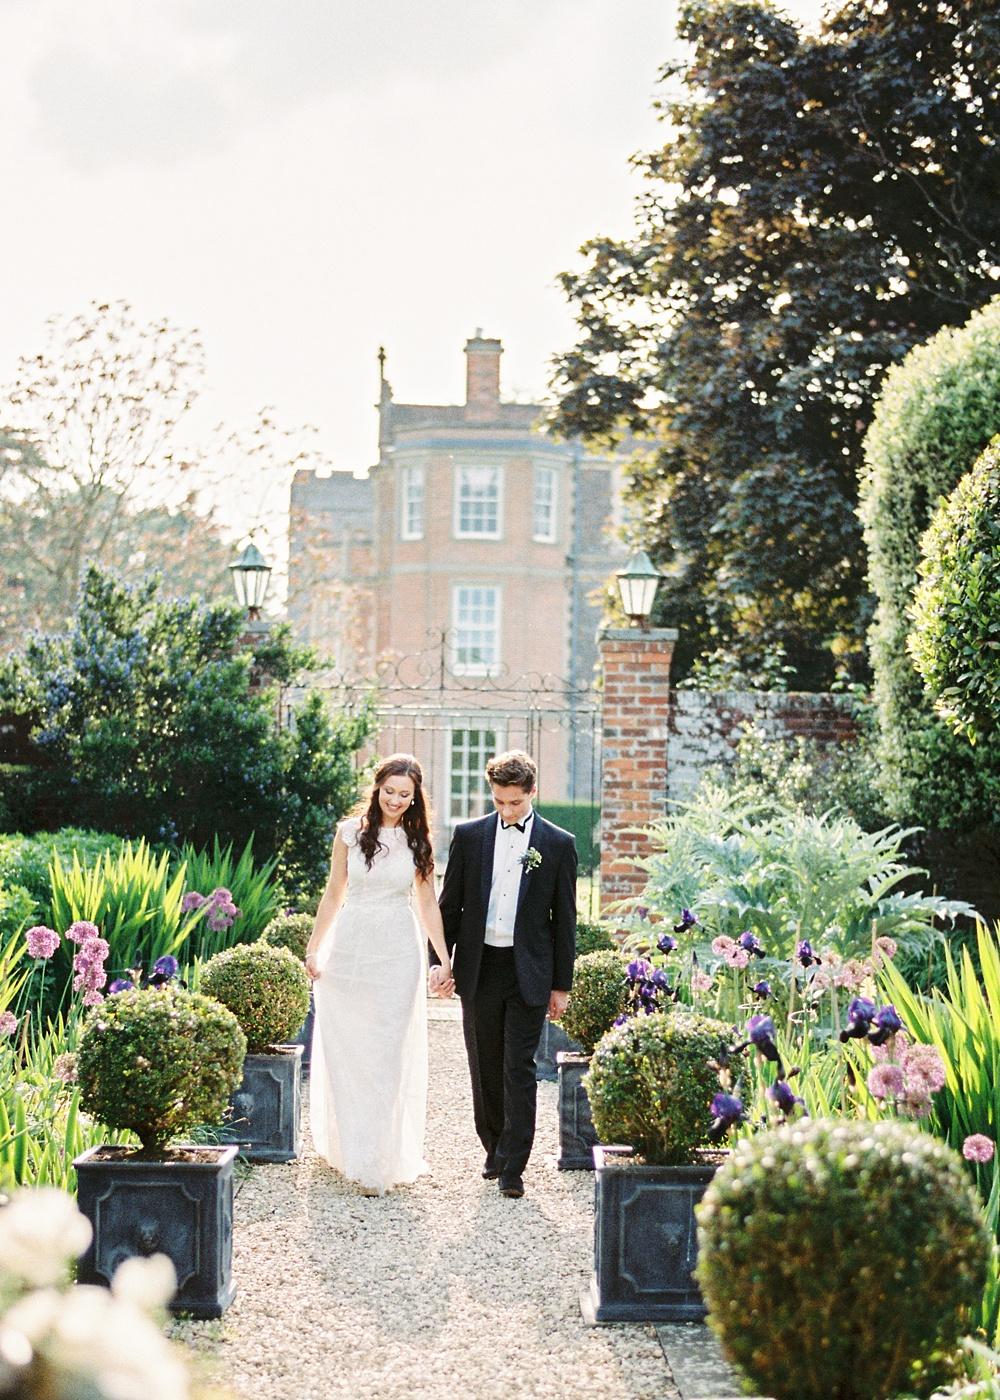 country wedding-charlotte munro wedding styling-wickham house-kate nielen_0003.jpg